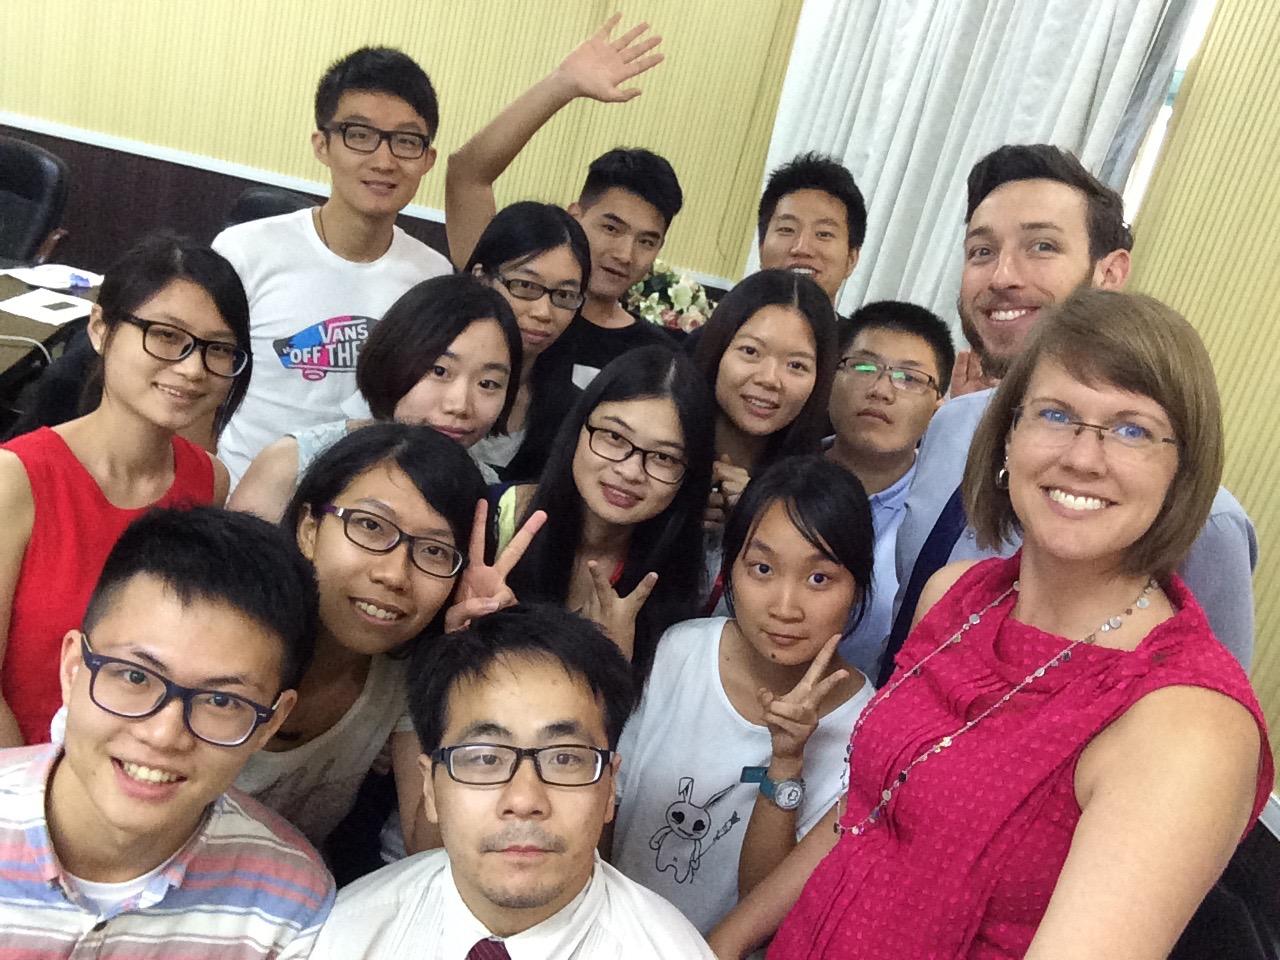 Guangzhou, China - session 1, immunity to change class